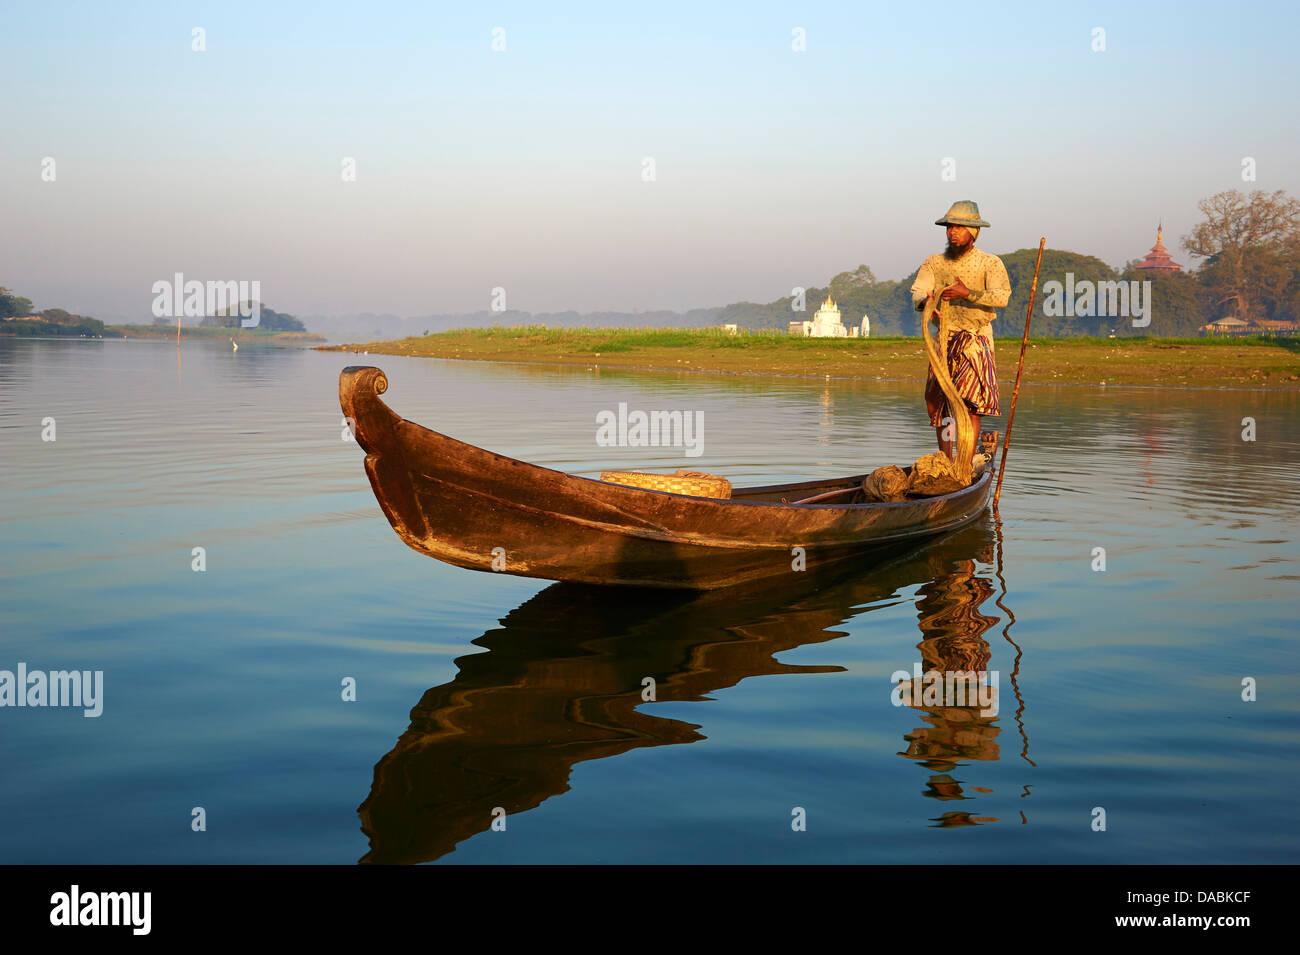 Fisherman on Taung Thama lake, Amarapura, Mandalay, Myanmar (Burma), Asia - Stock Image